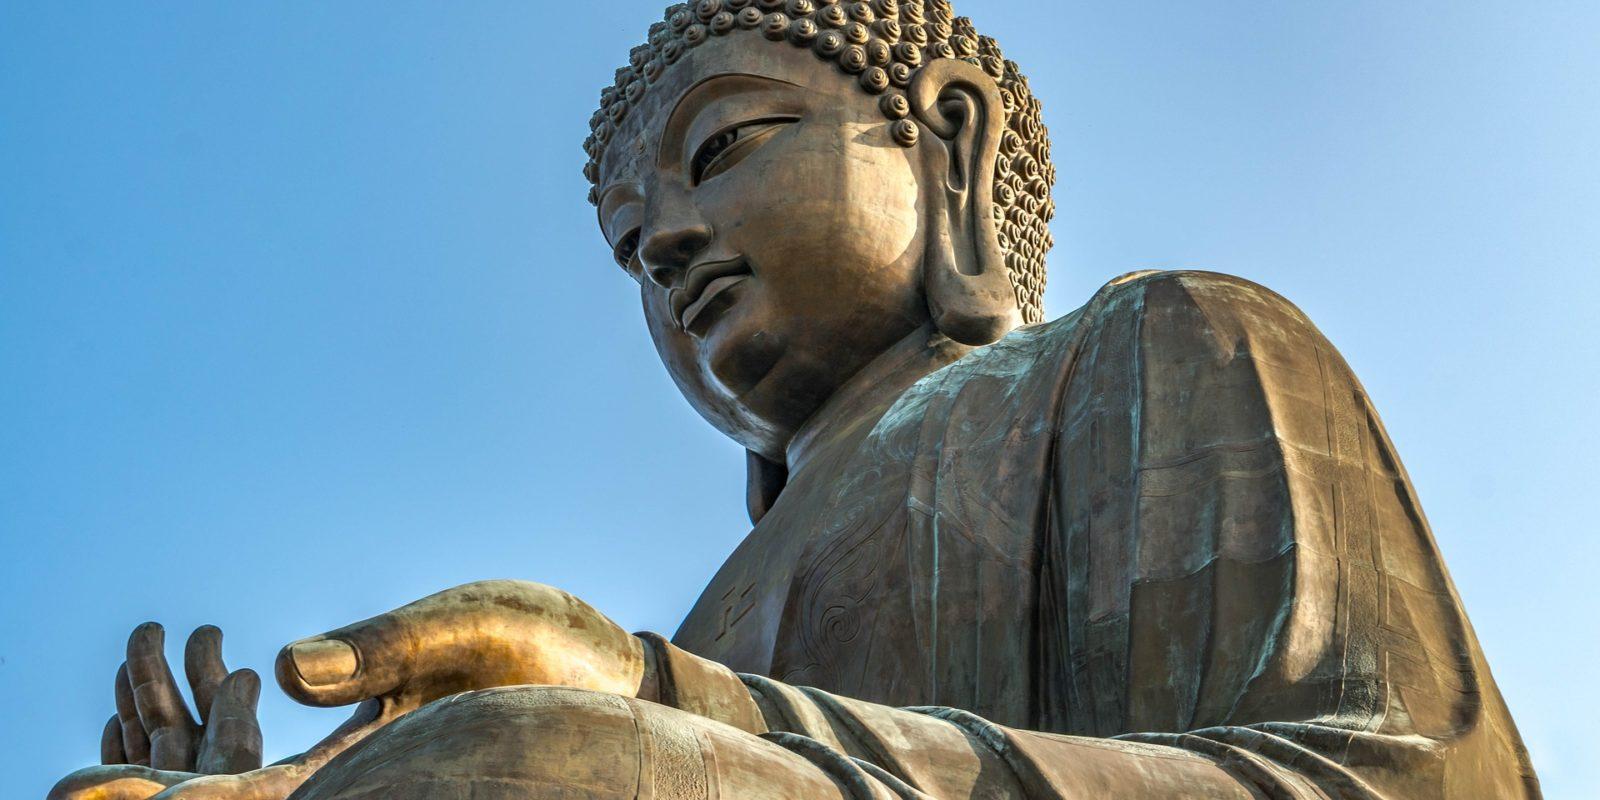 Extraordinary Tian Tan Buddha statue at the Po Lin Monastery, Hong Kong